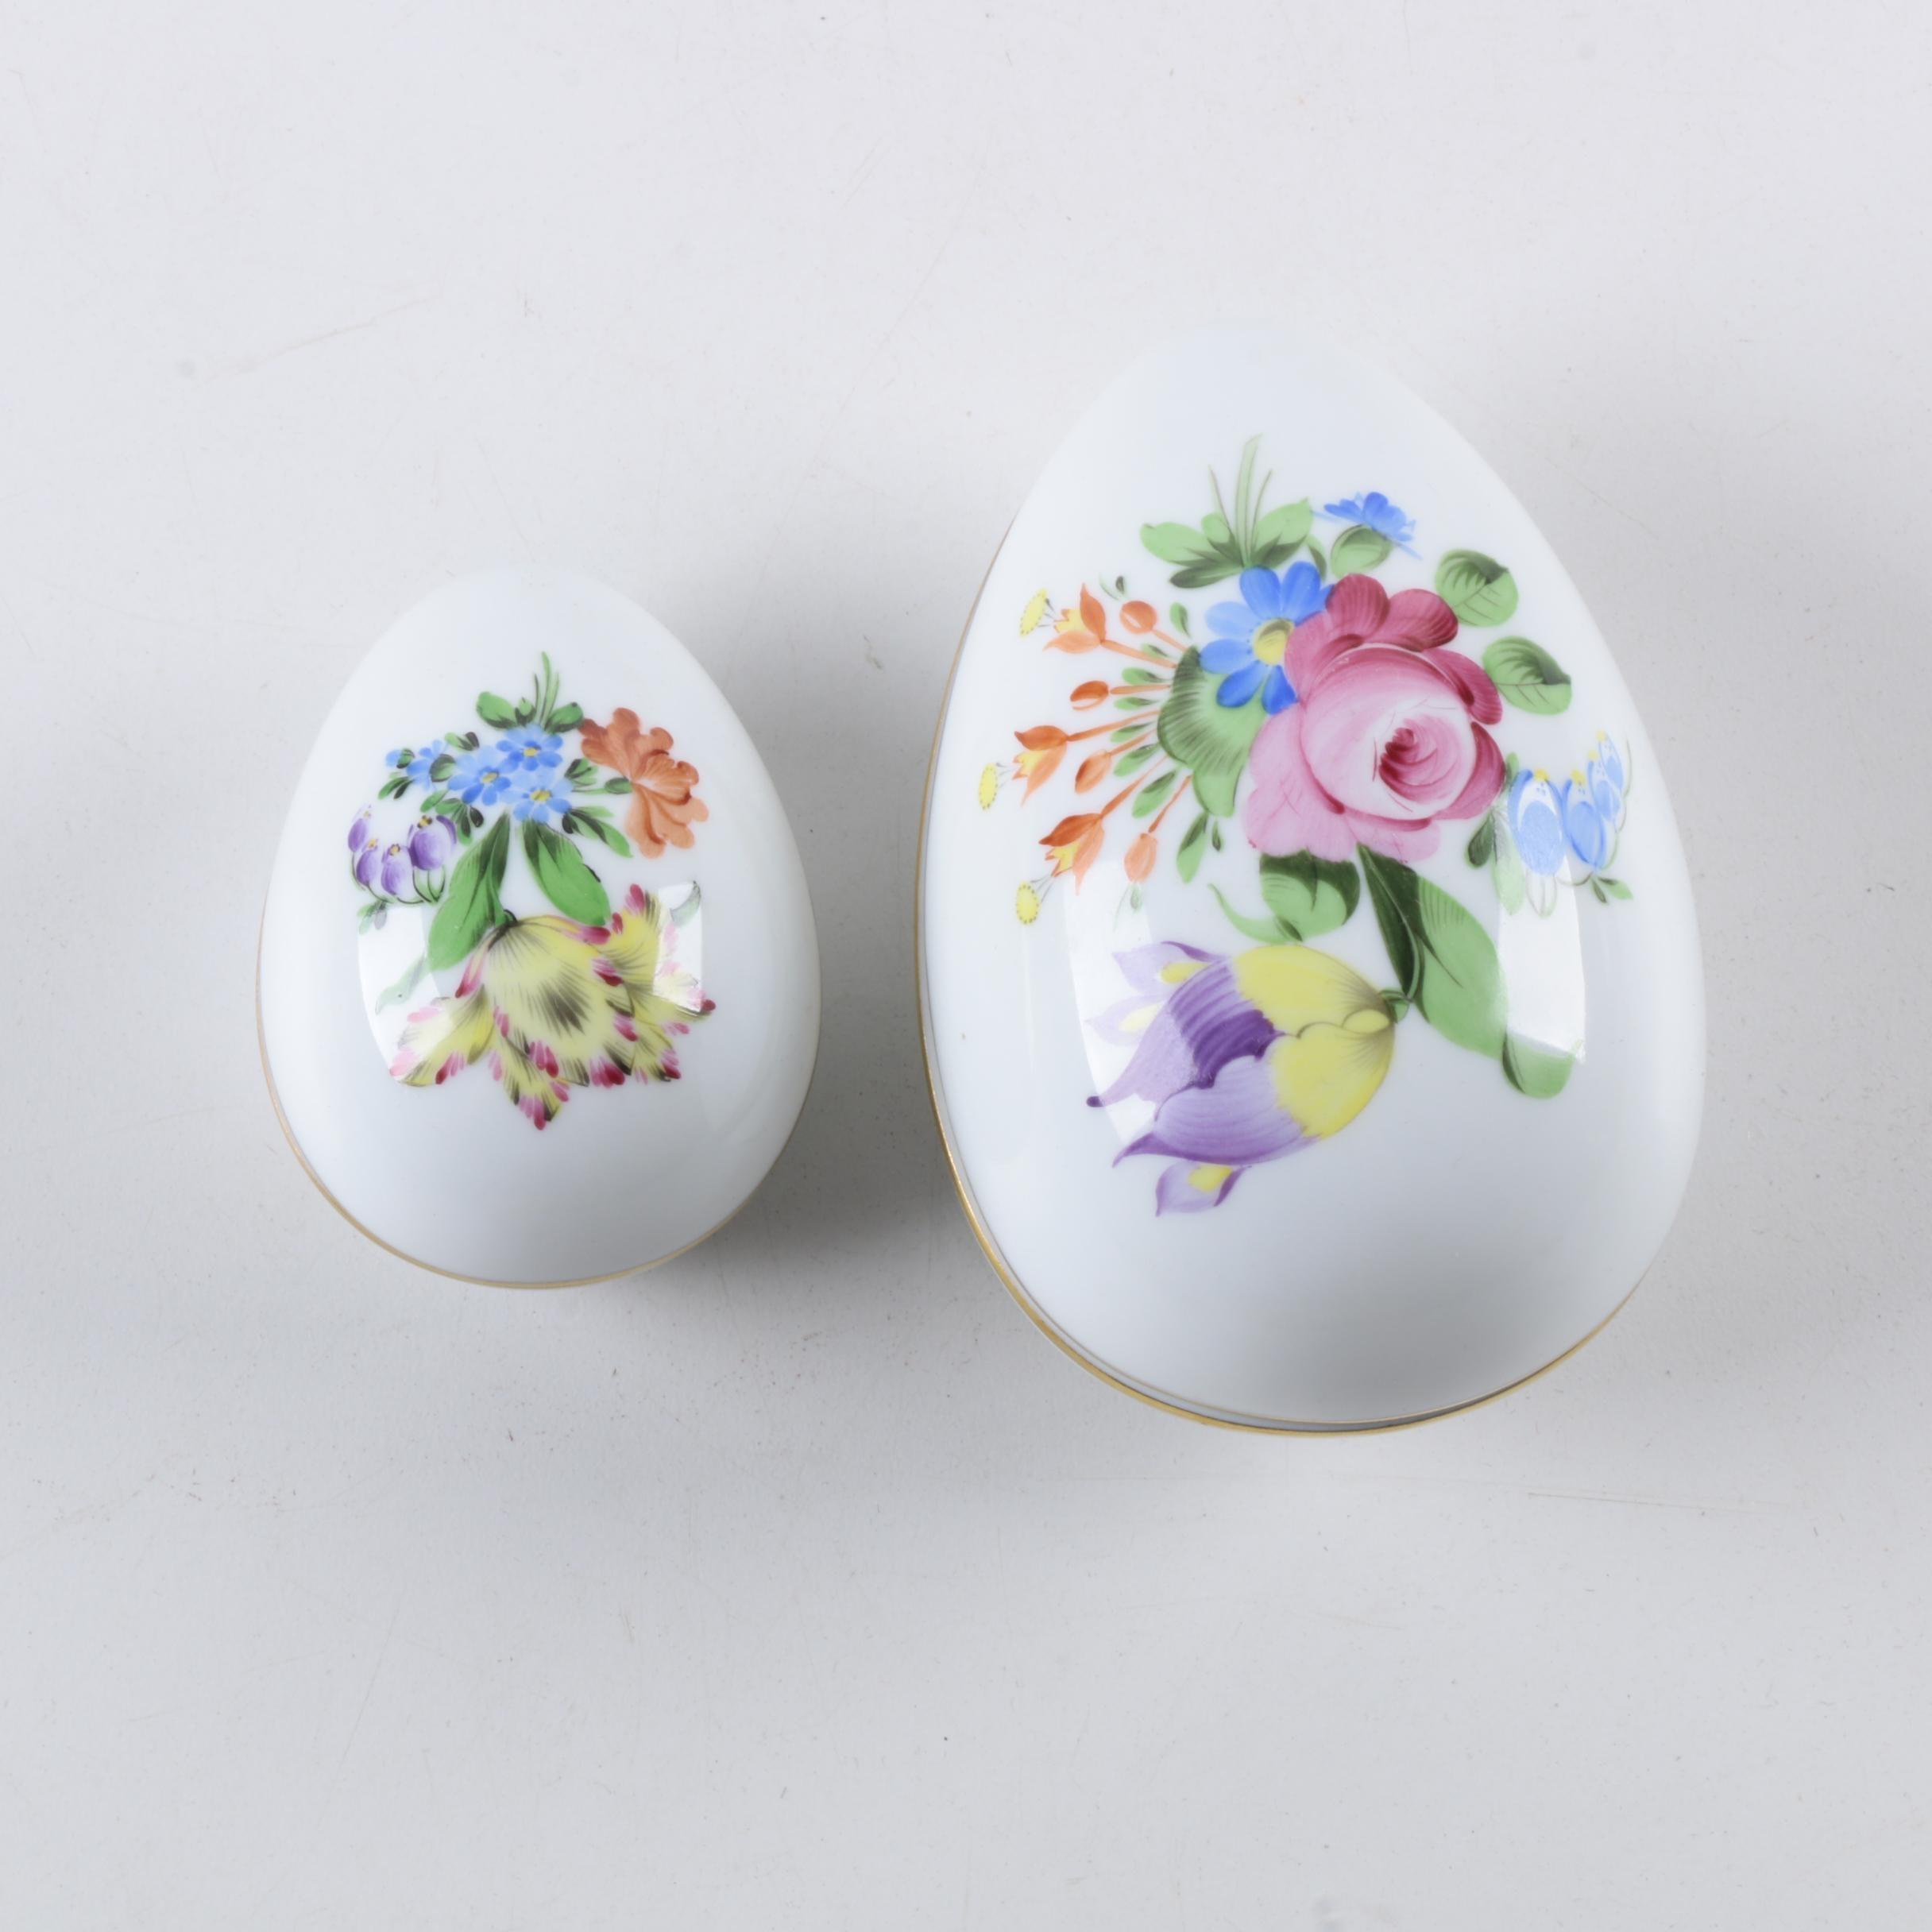 Herend Hand Painted Porcelain Egg Trinket Boxes